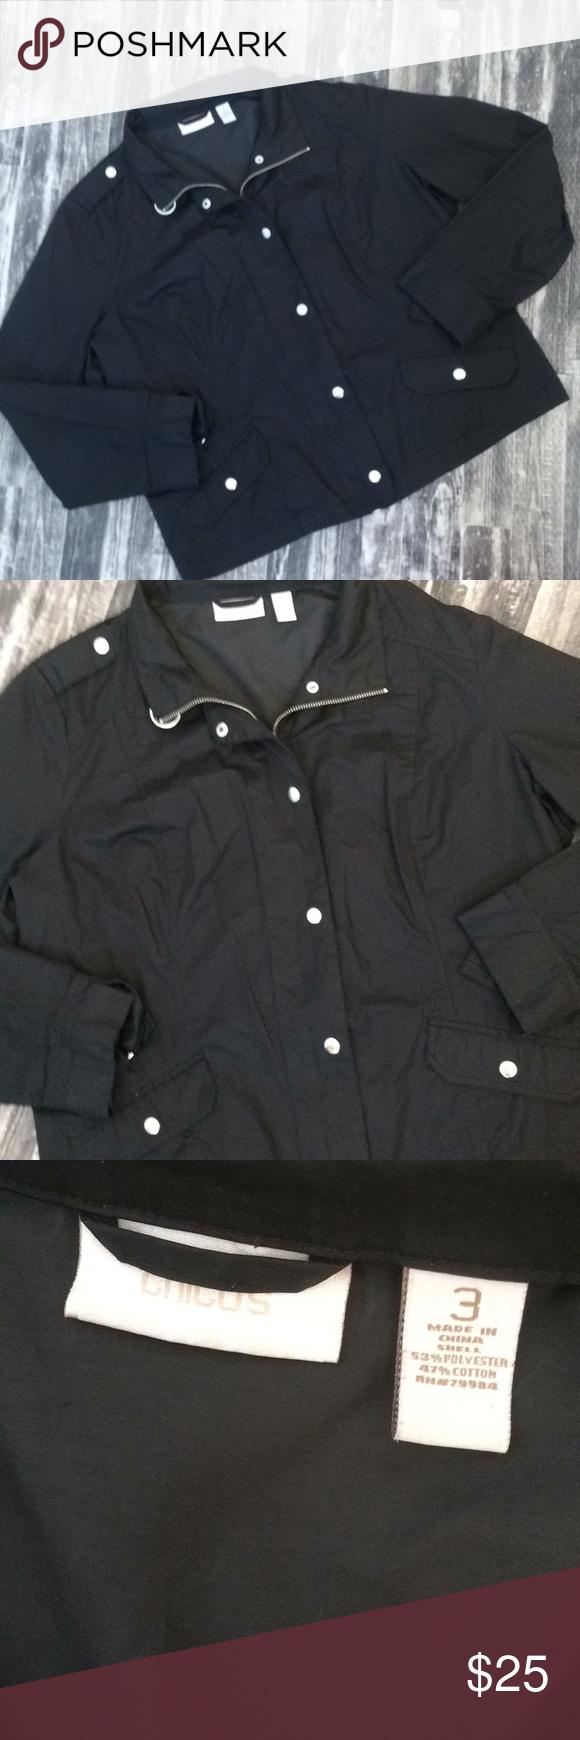 Chico/'s Light Jacket Size 3